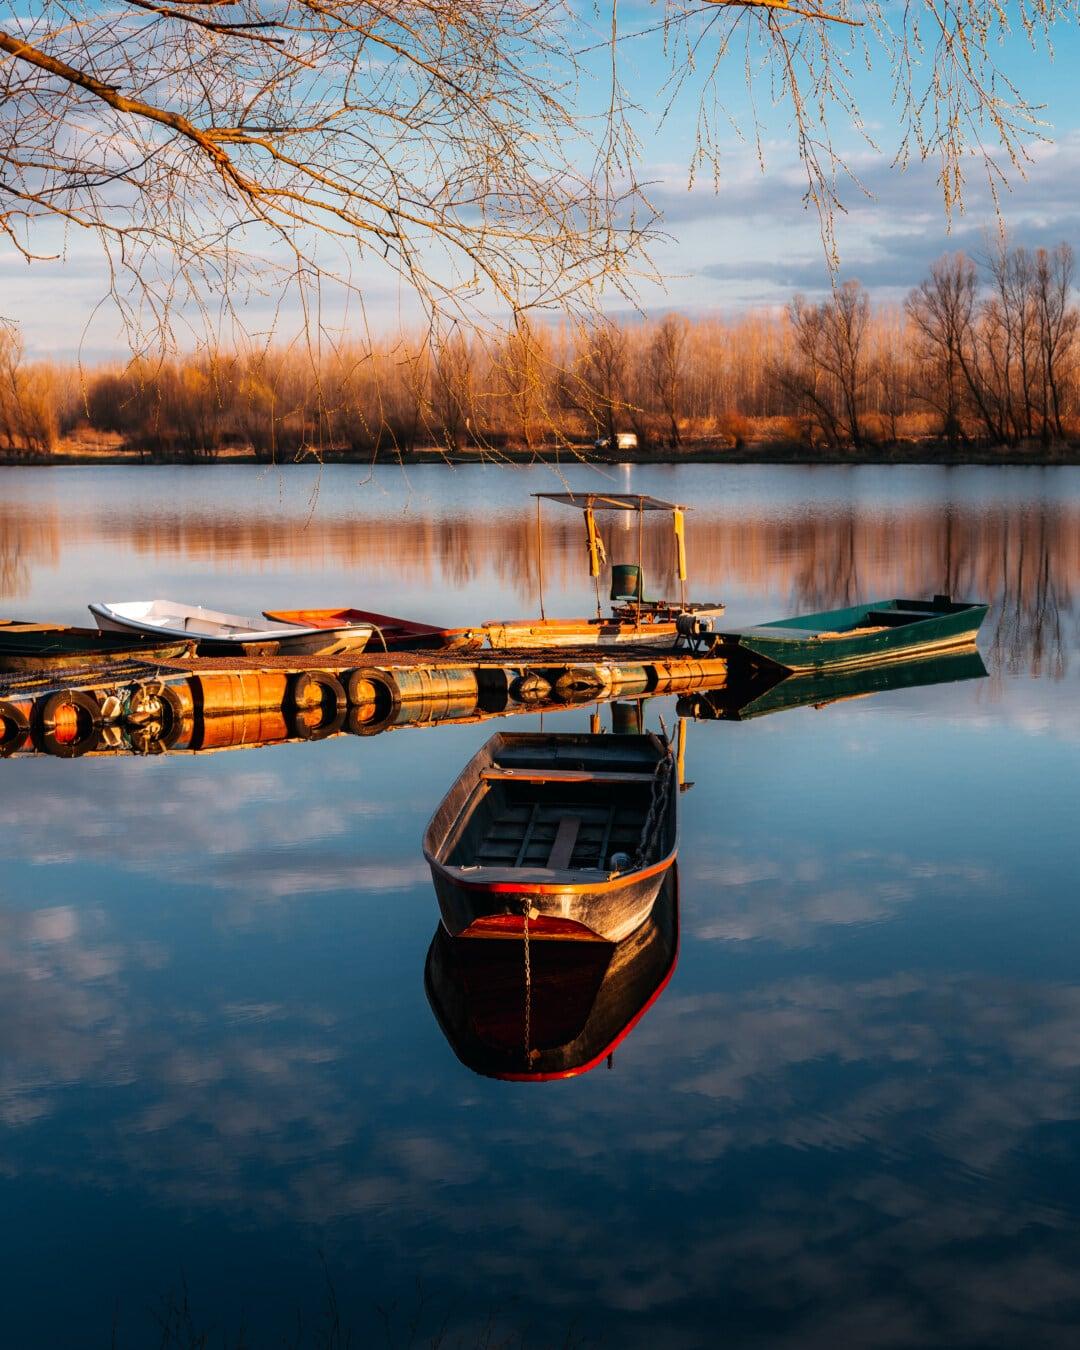 пристанище, пейзаж, величествен, лодки, здрач, рибарска лодка, моторница, вода, езеро, отражение